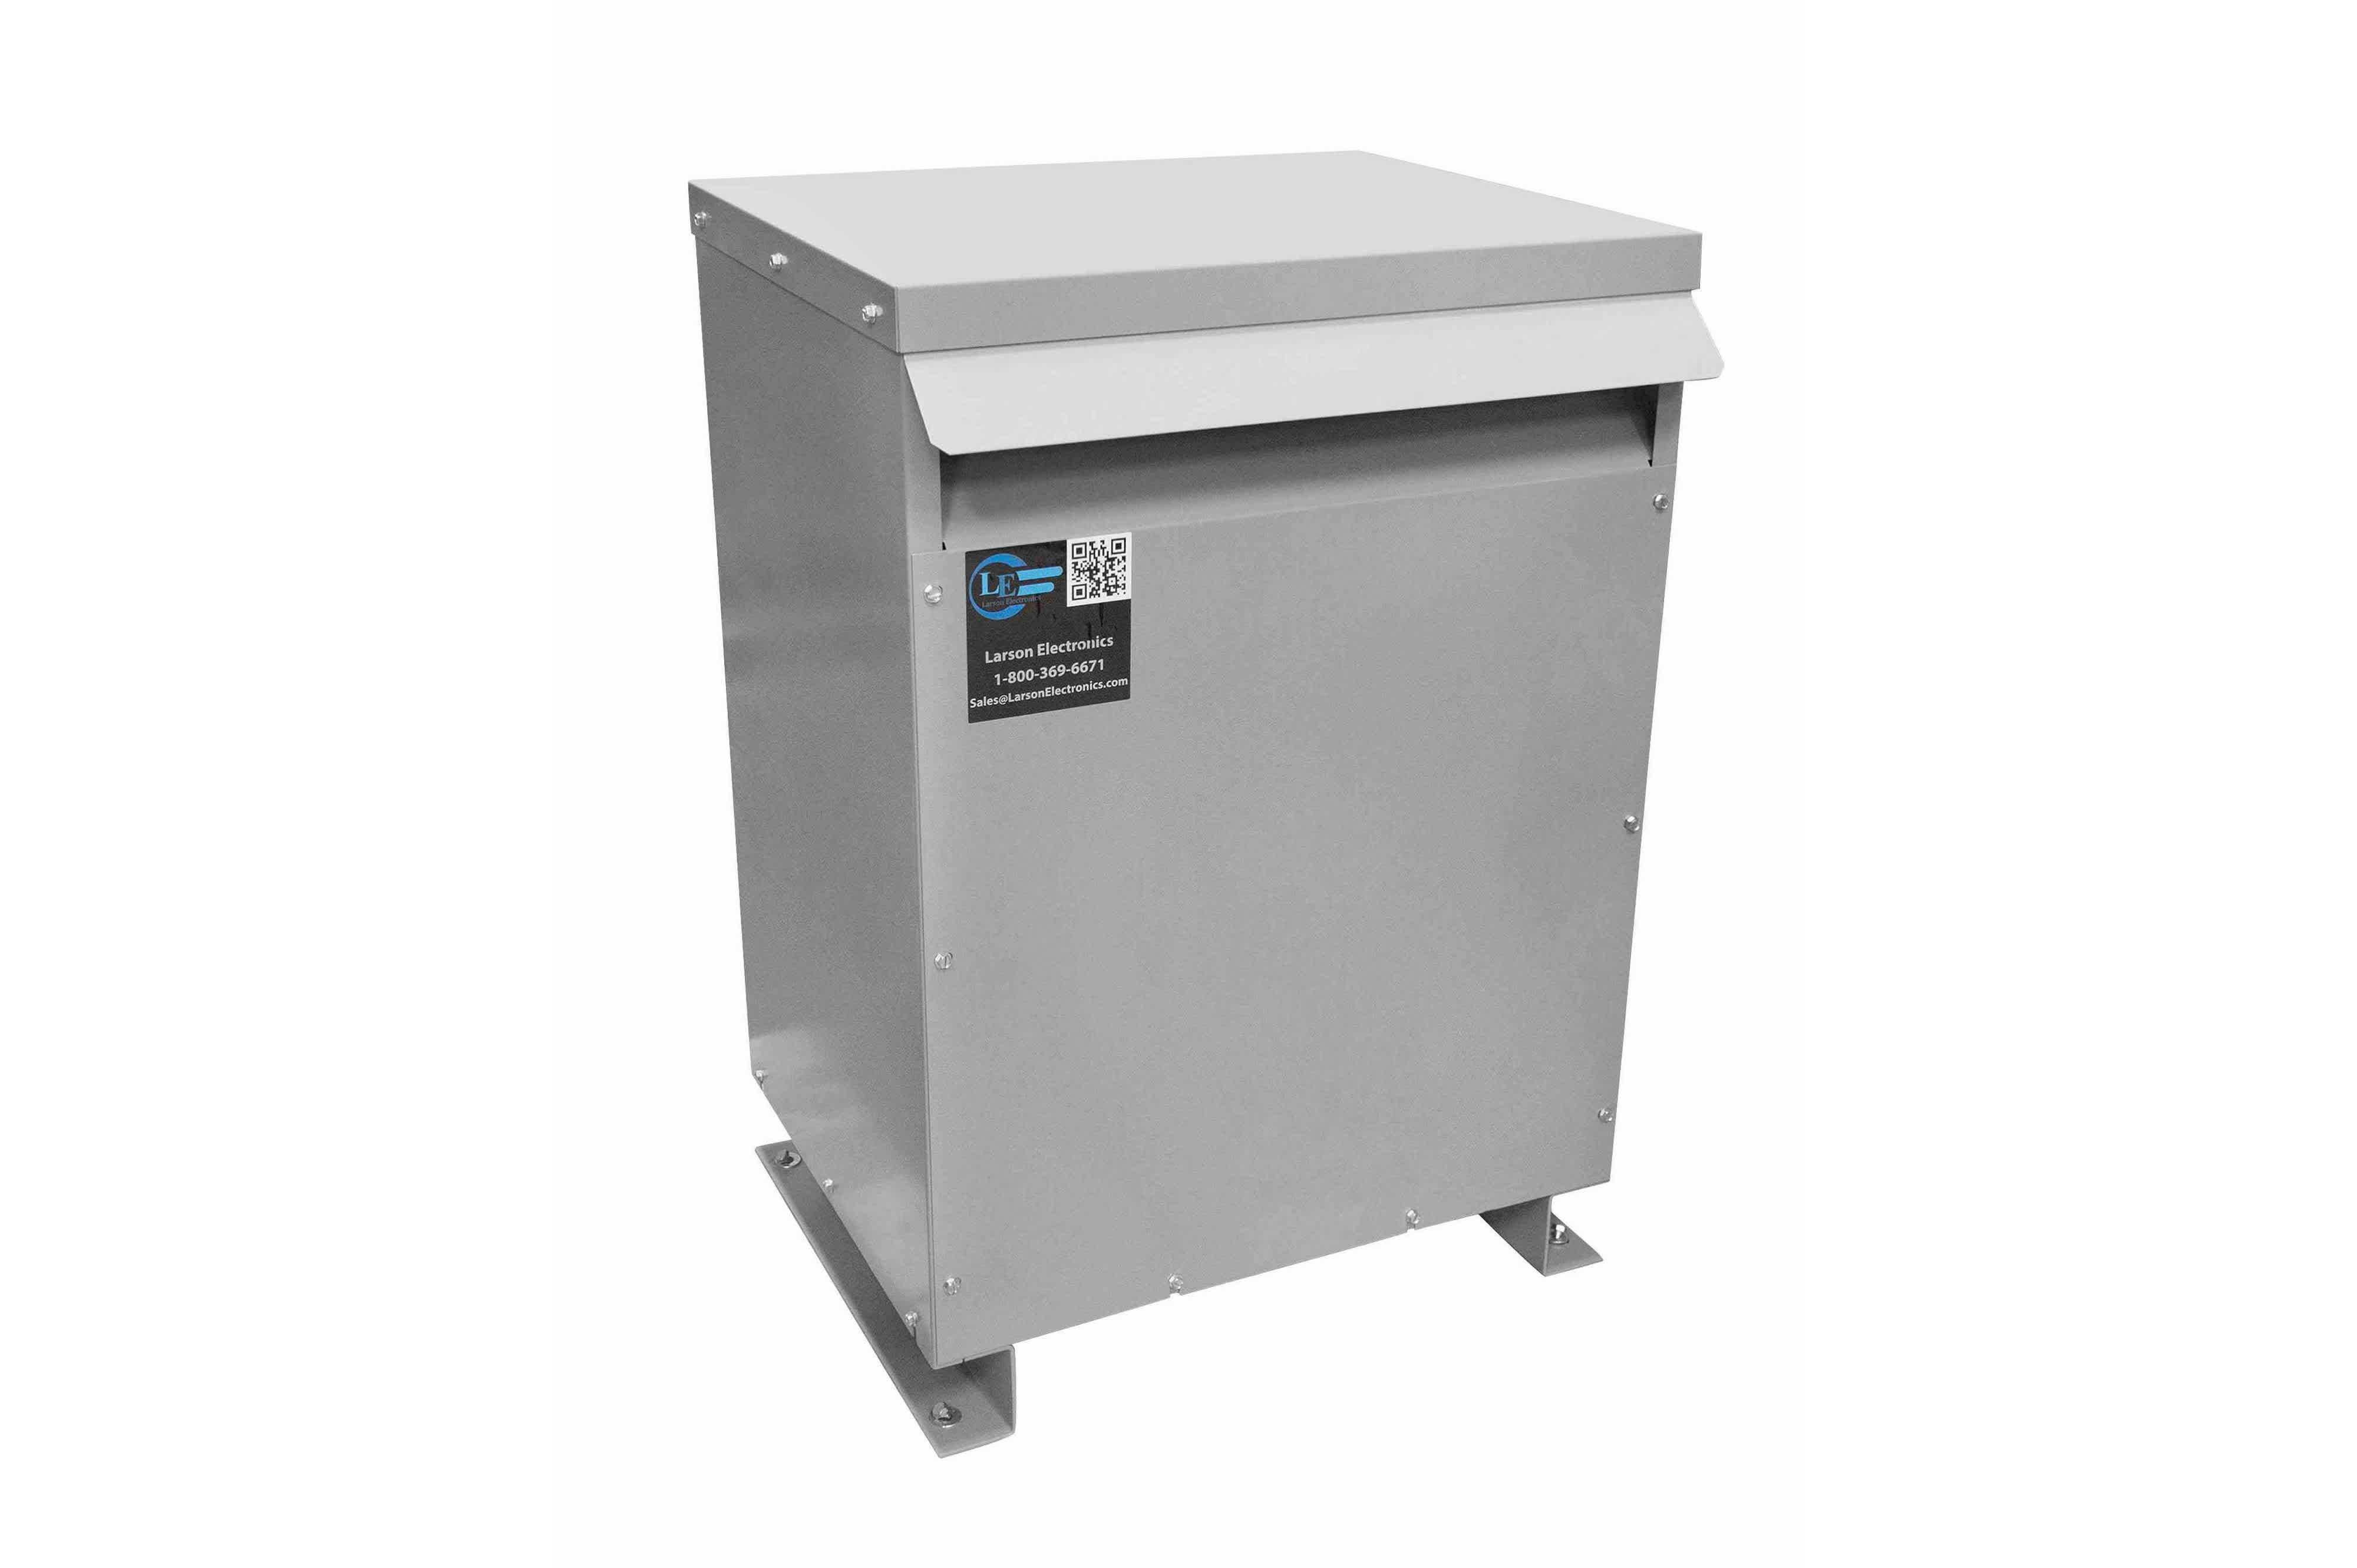 42.5 kVA 3PH Isolation Transformer, 240V Wye Primary, 415V Delta Secondary, N3R, Ventilated, 60 Hz